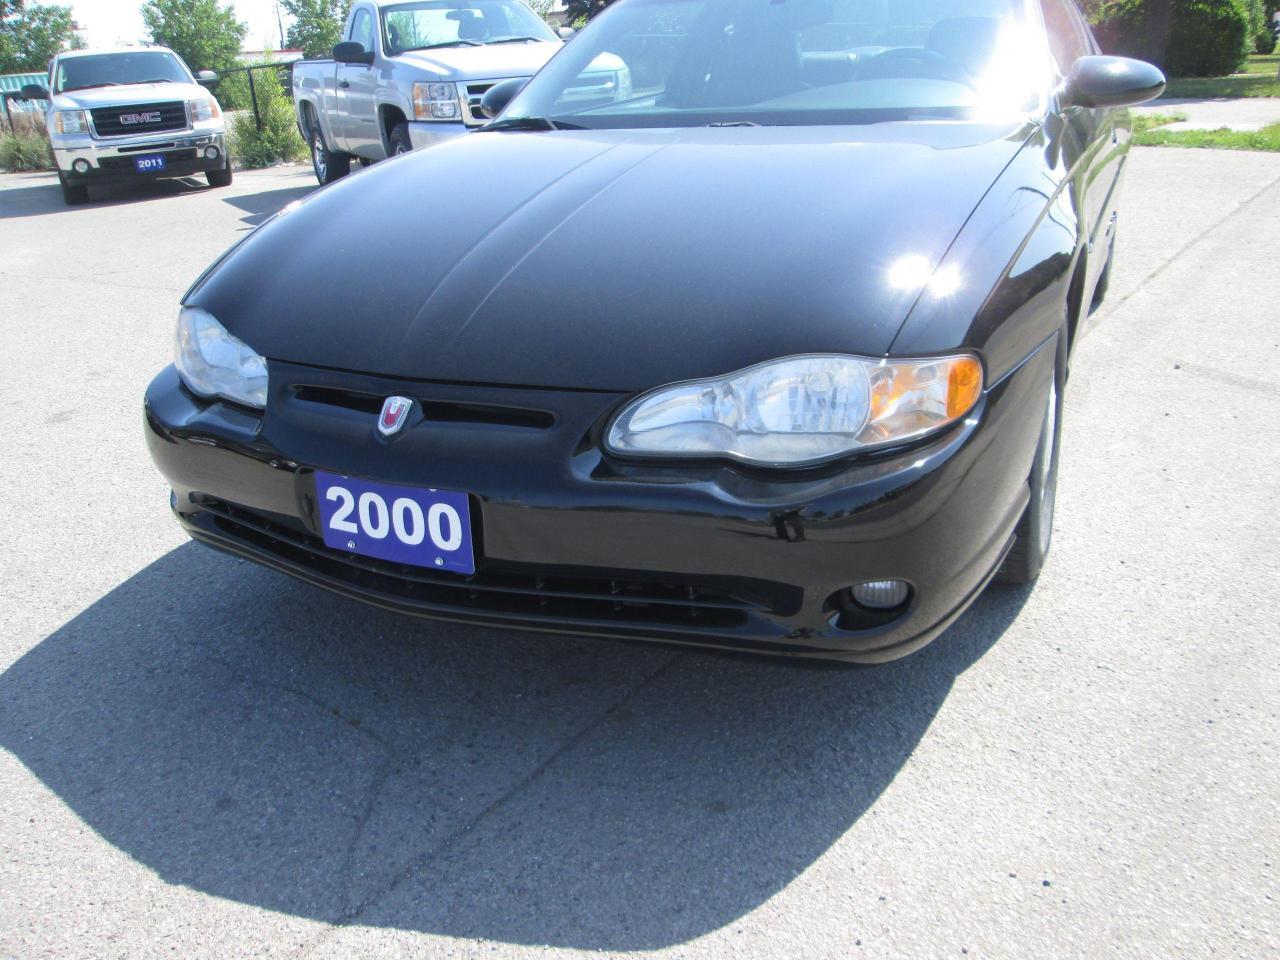 2000 Chevrolet Monte Carlo